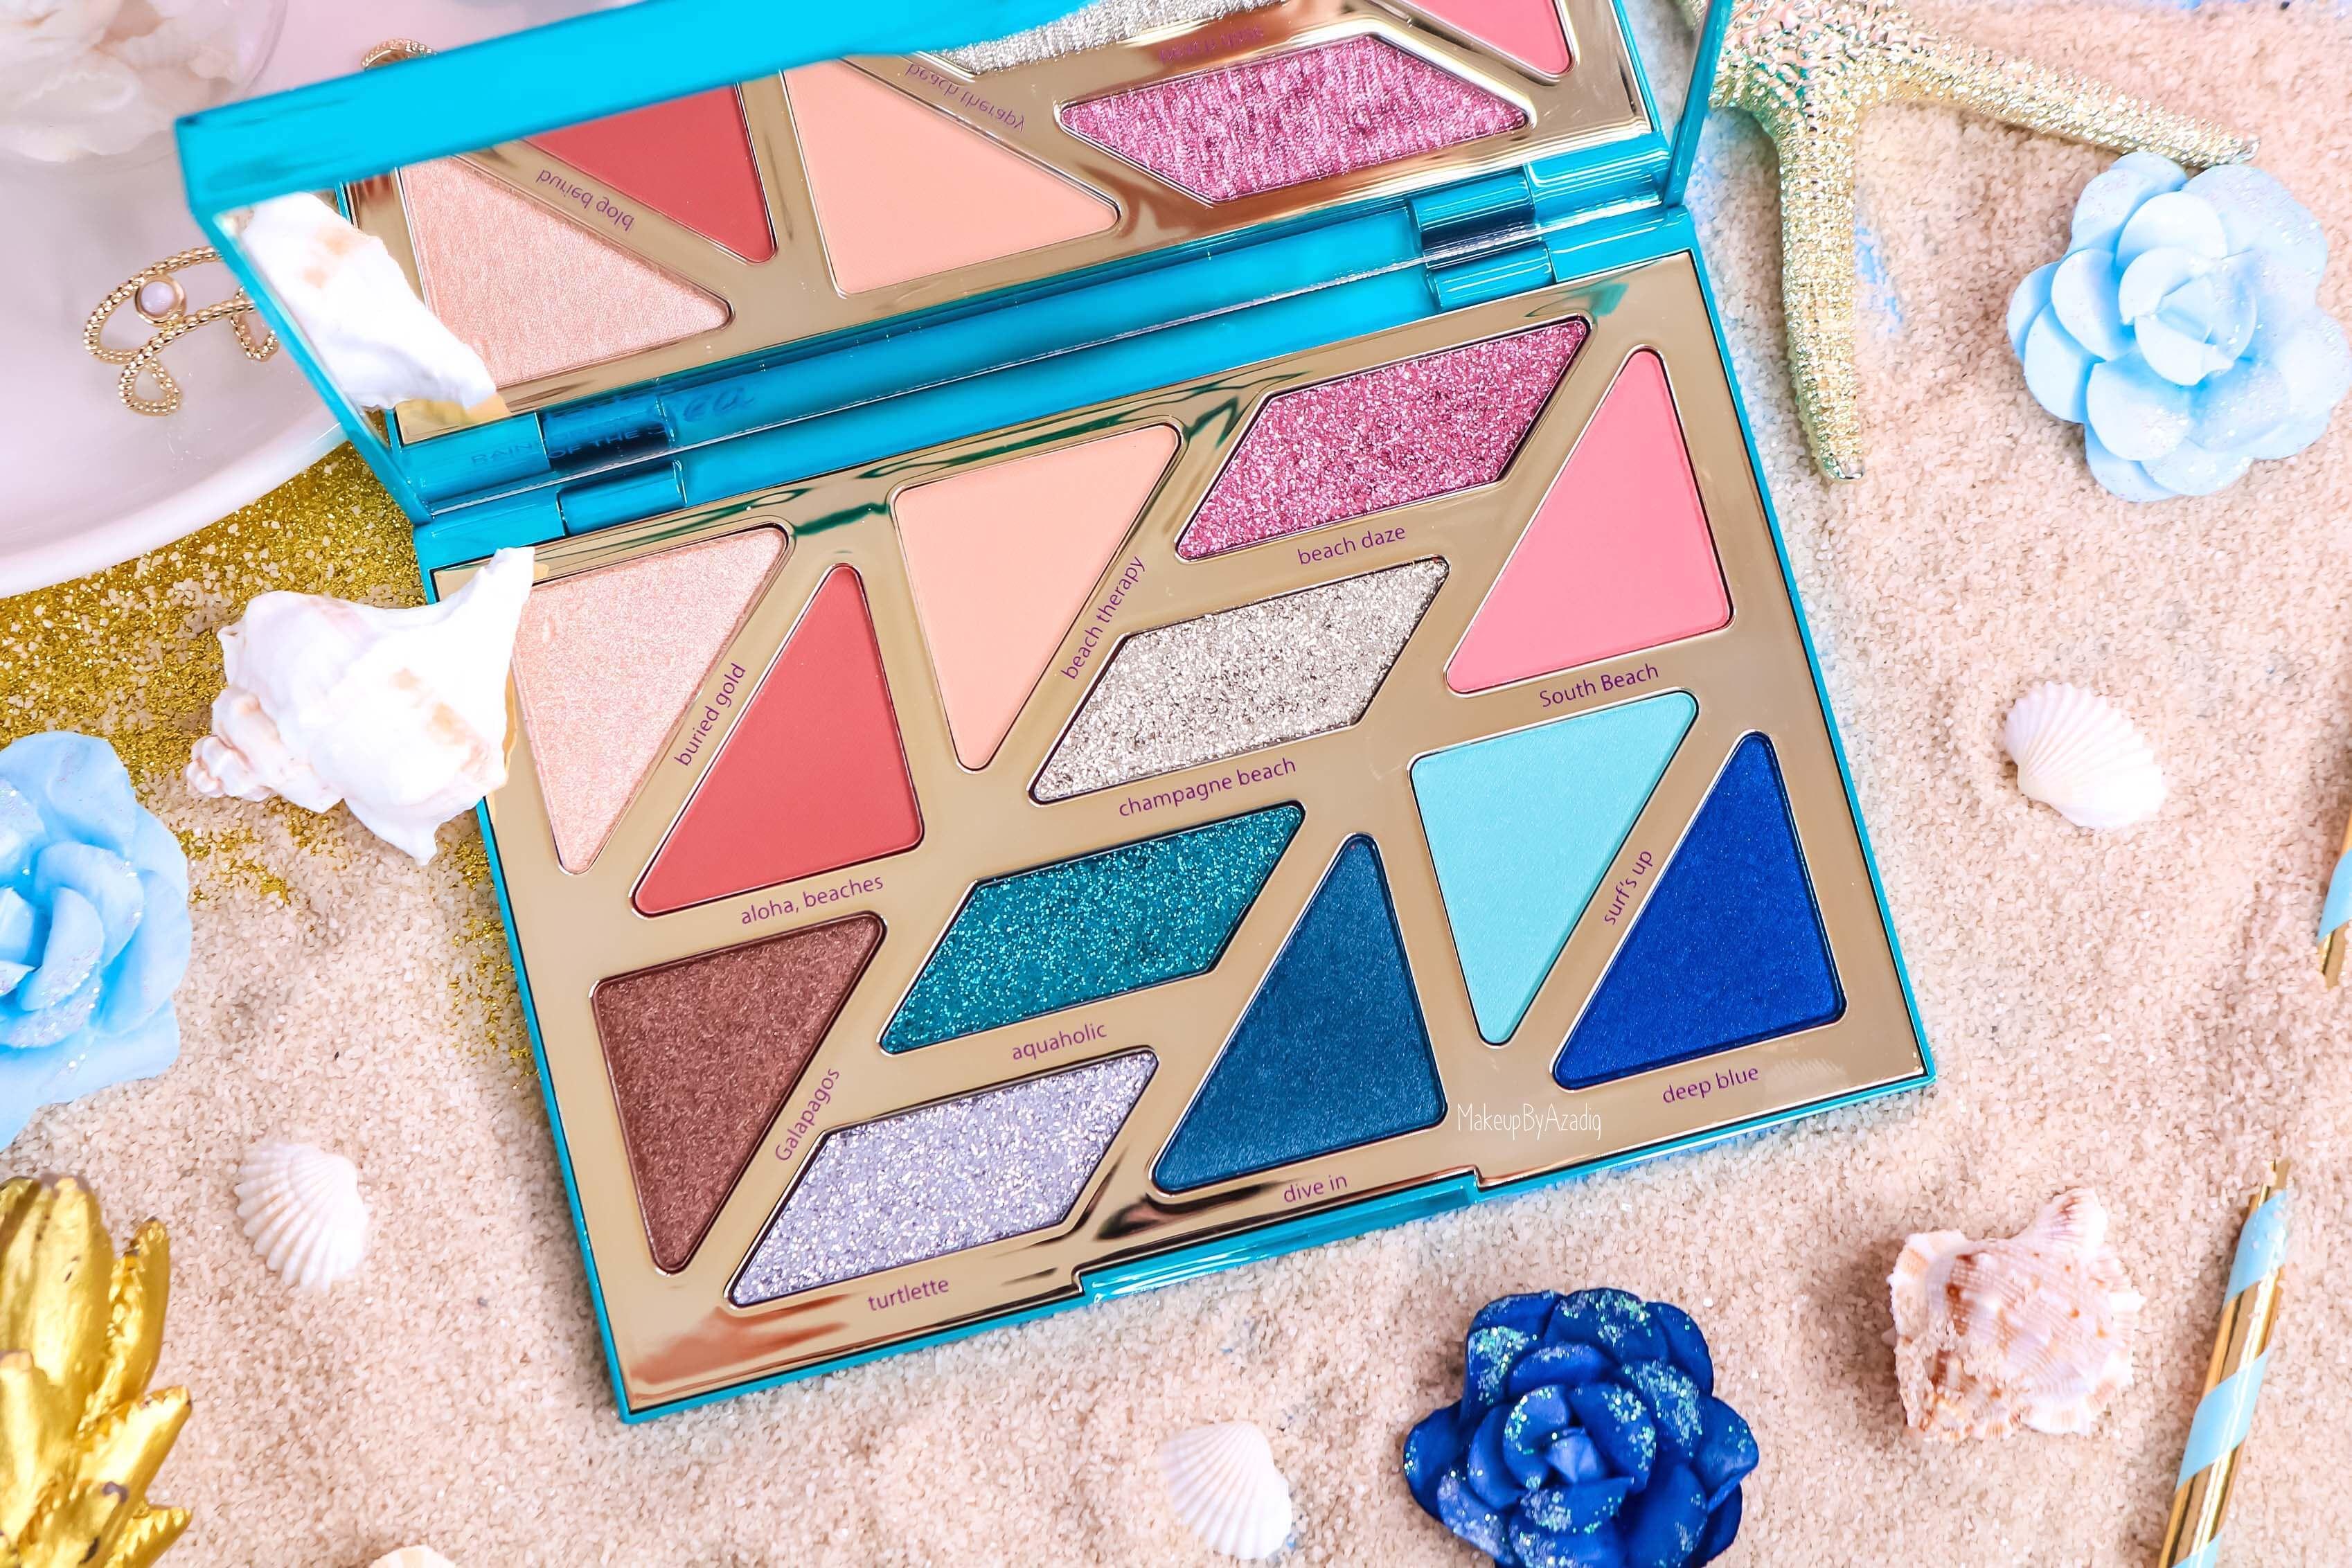 revue-palette-tarte-cosmetics-france-sephora-makeupbyazadig-swatch-prix-avis-rainforest-of-the-sea-colors